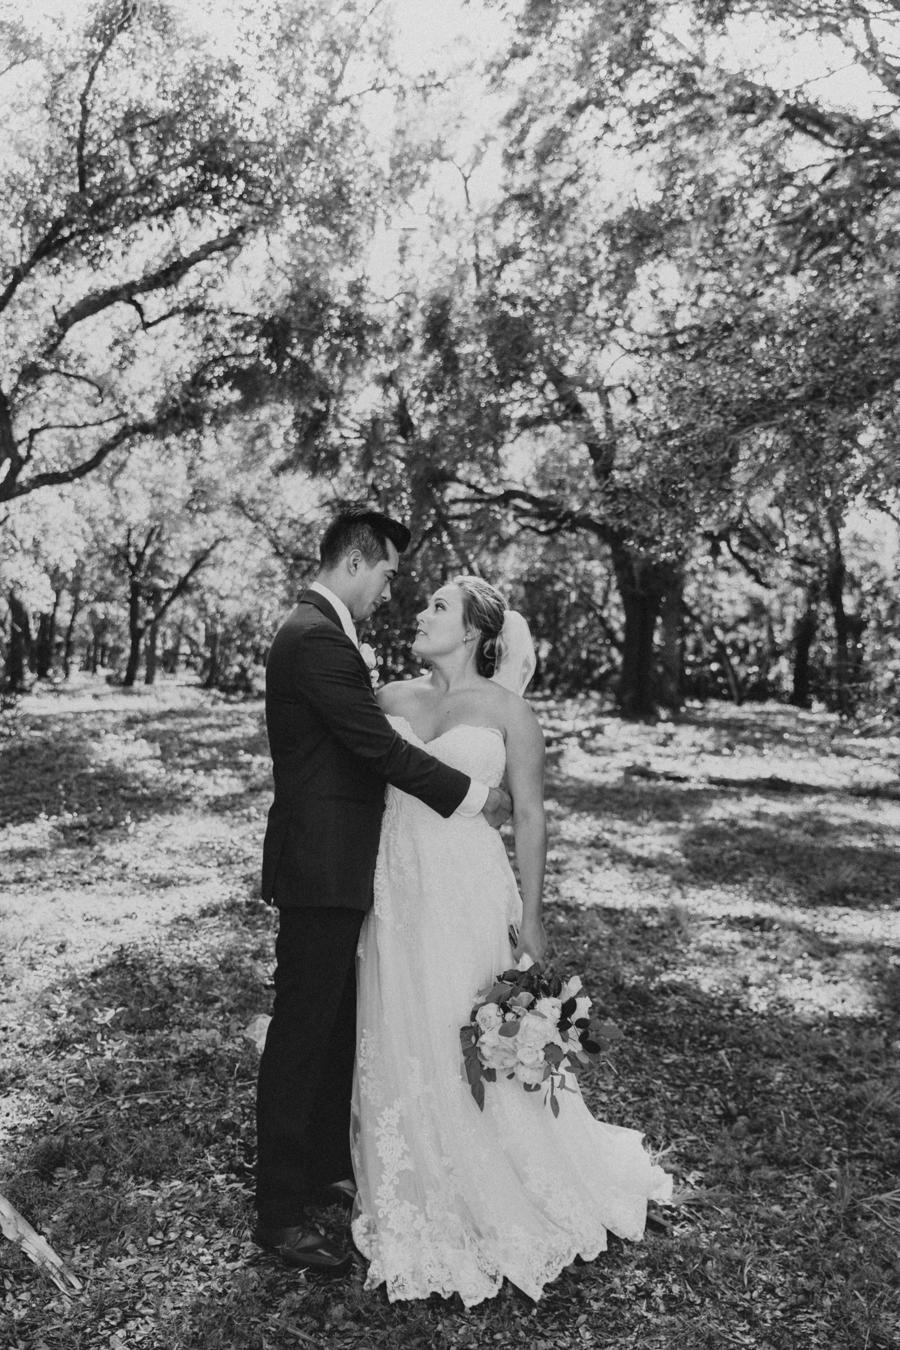 Harborside Chapel Wedding Clearwater Affordable Tampa Venues BHLDN Palm Harbor Safety Harbor Resort and Spa Wedding Malindy Elene Bridal St Pete Wedding Photographer Tampa Wedding Photographer-94.jpg